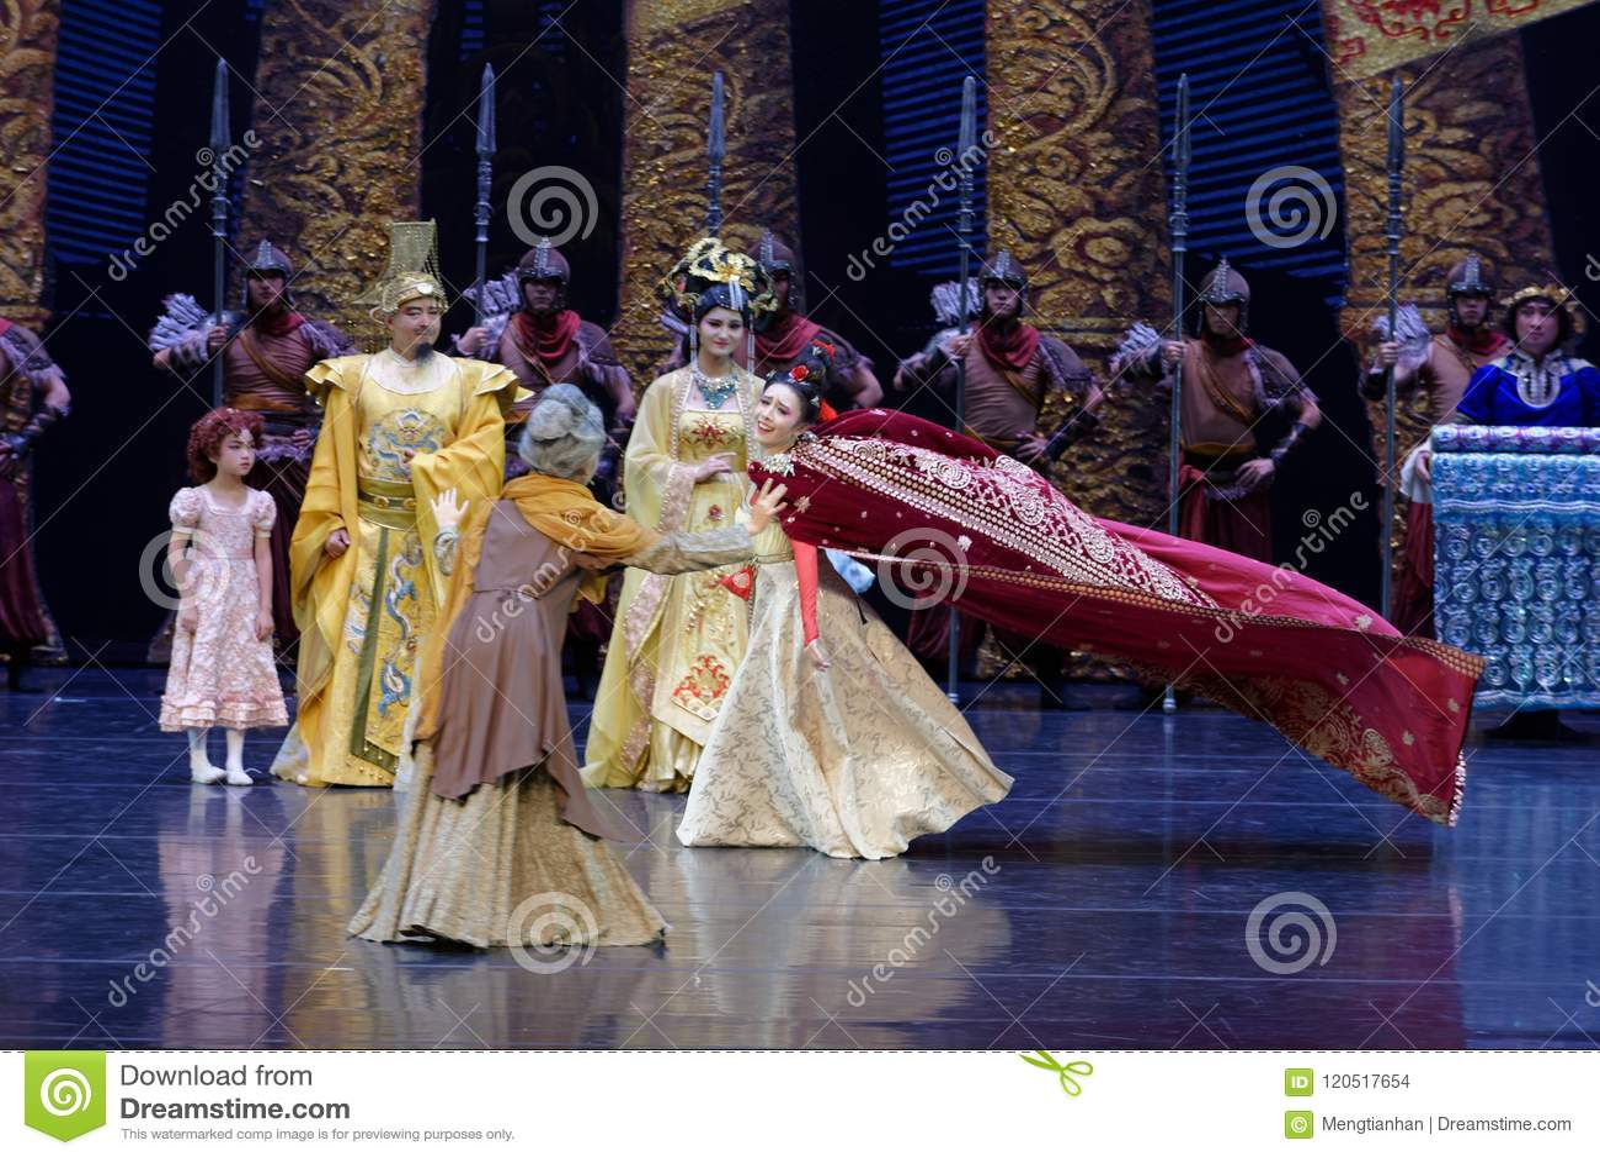 Dynasty: the reunion (tvm) john forsythe, jessica player, linda.